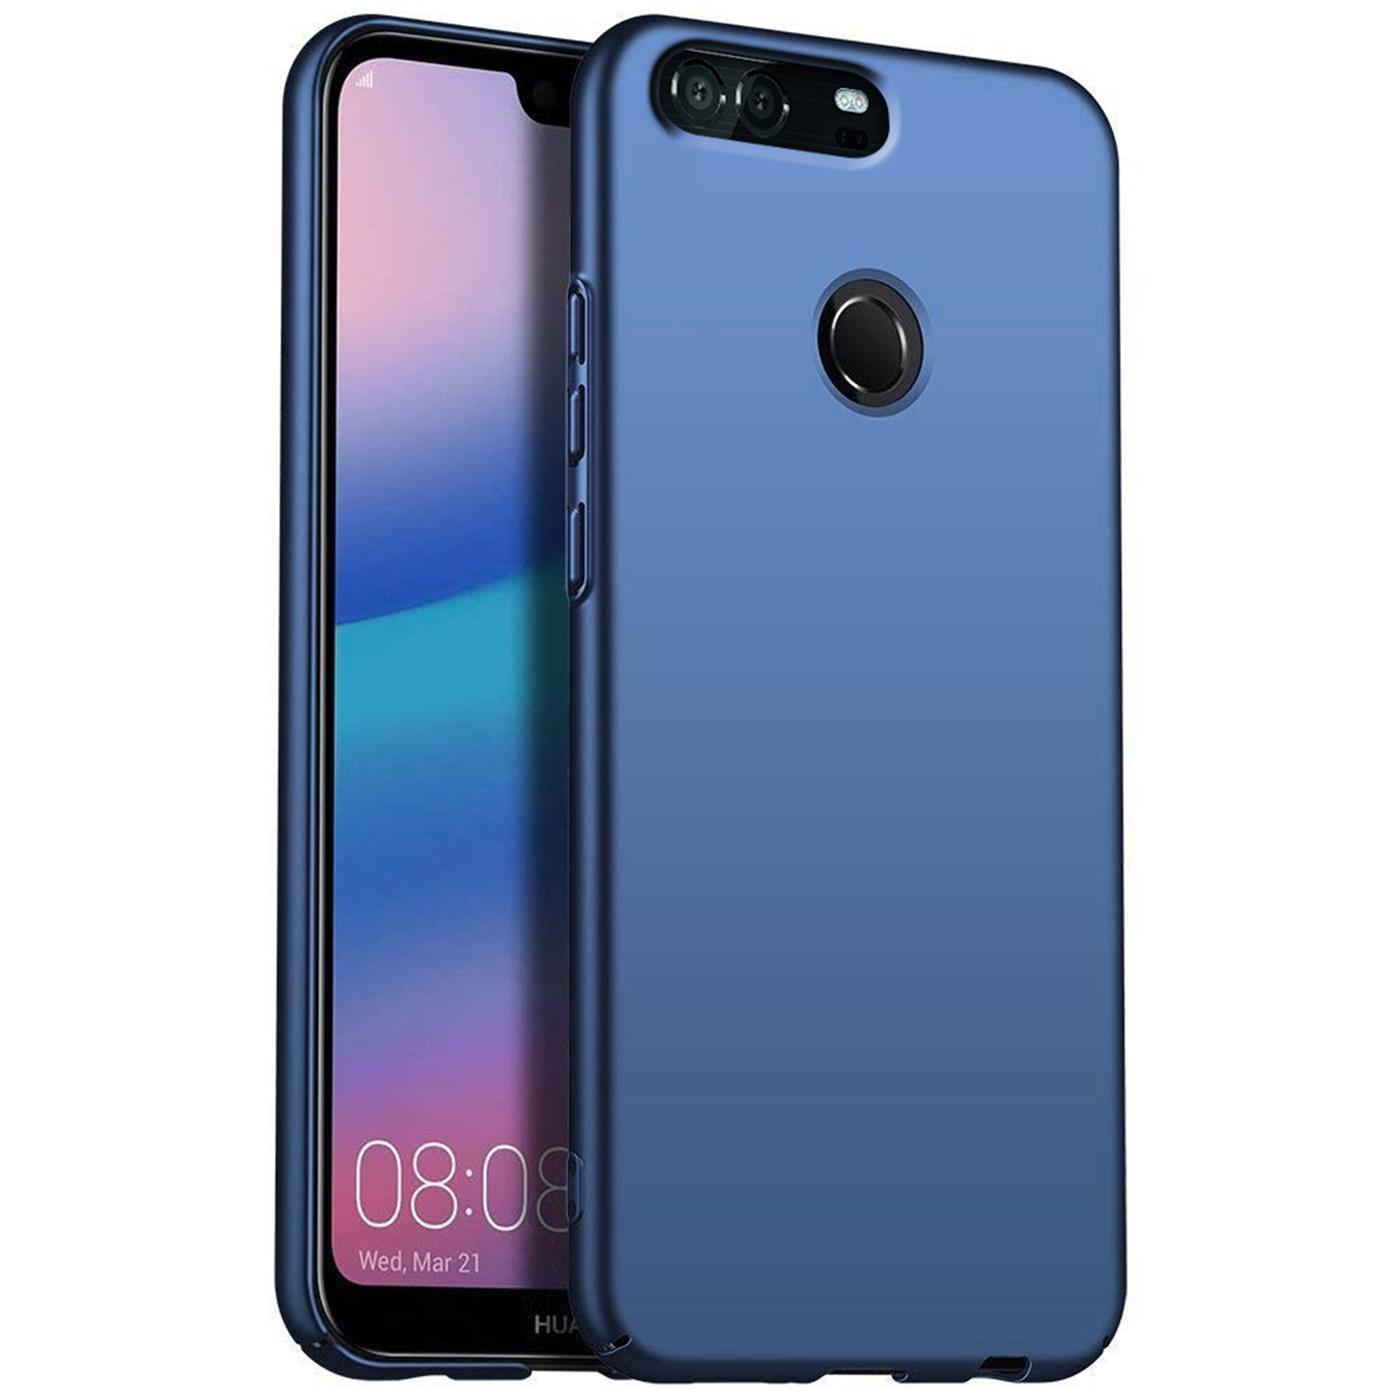 Hard-Back-Case-Cover-Huawei-p10-duenn-Cover-Slim-Shockproof-Rugged Indexbild 10